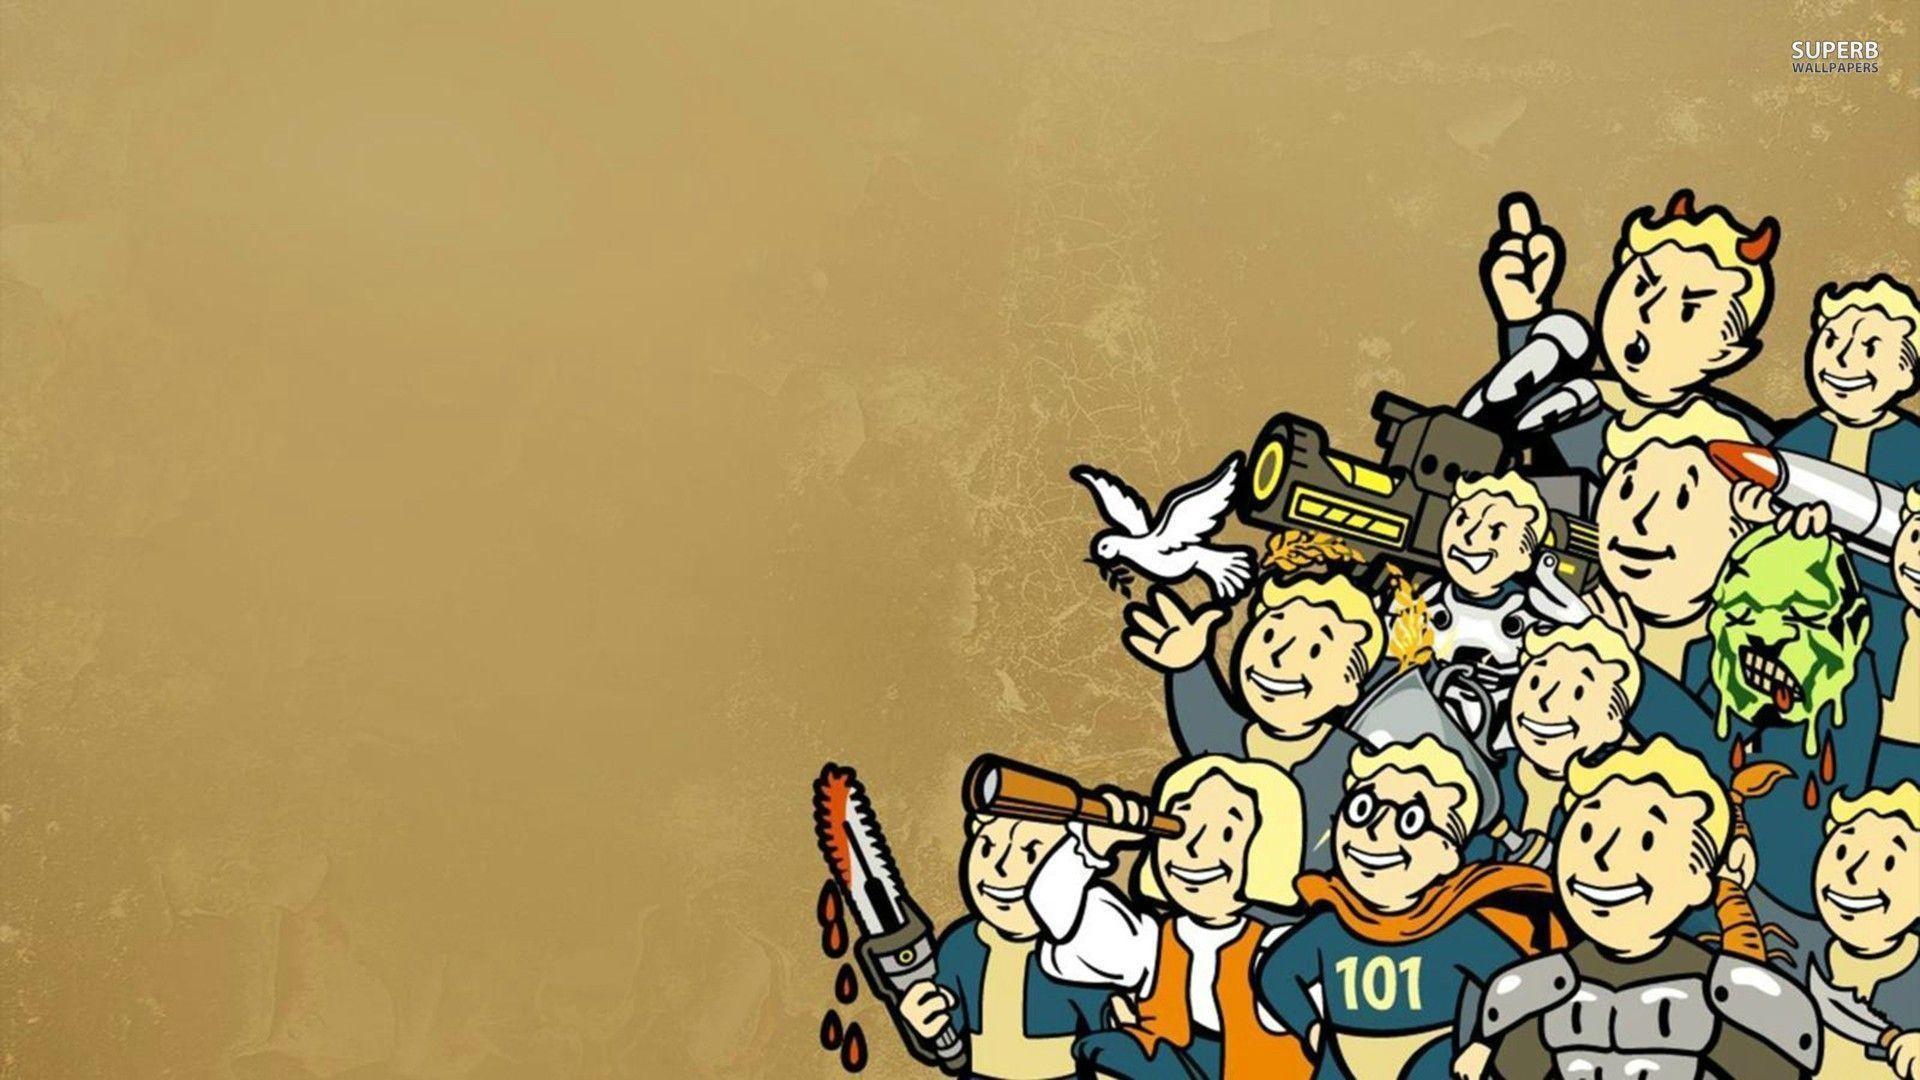 Vault Boy – Fallout wallpaper – Game wallpapers – #